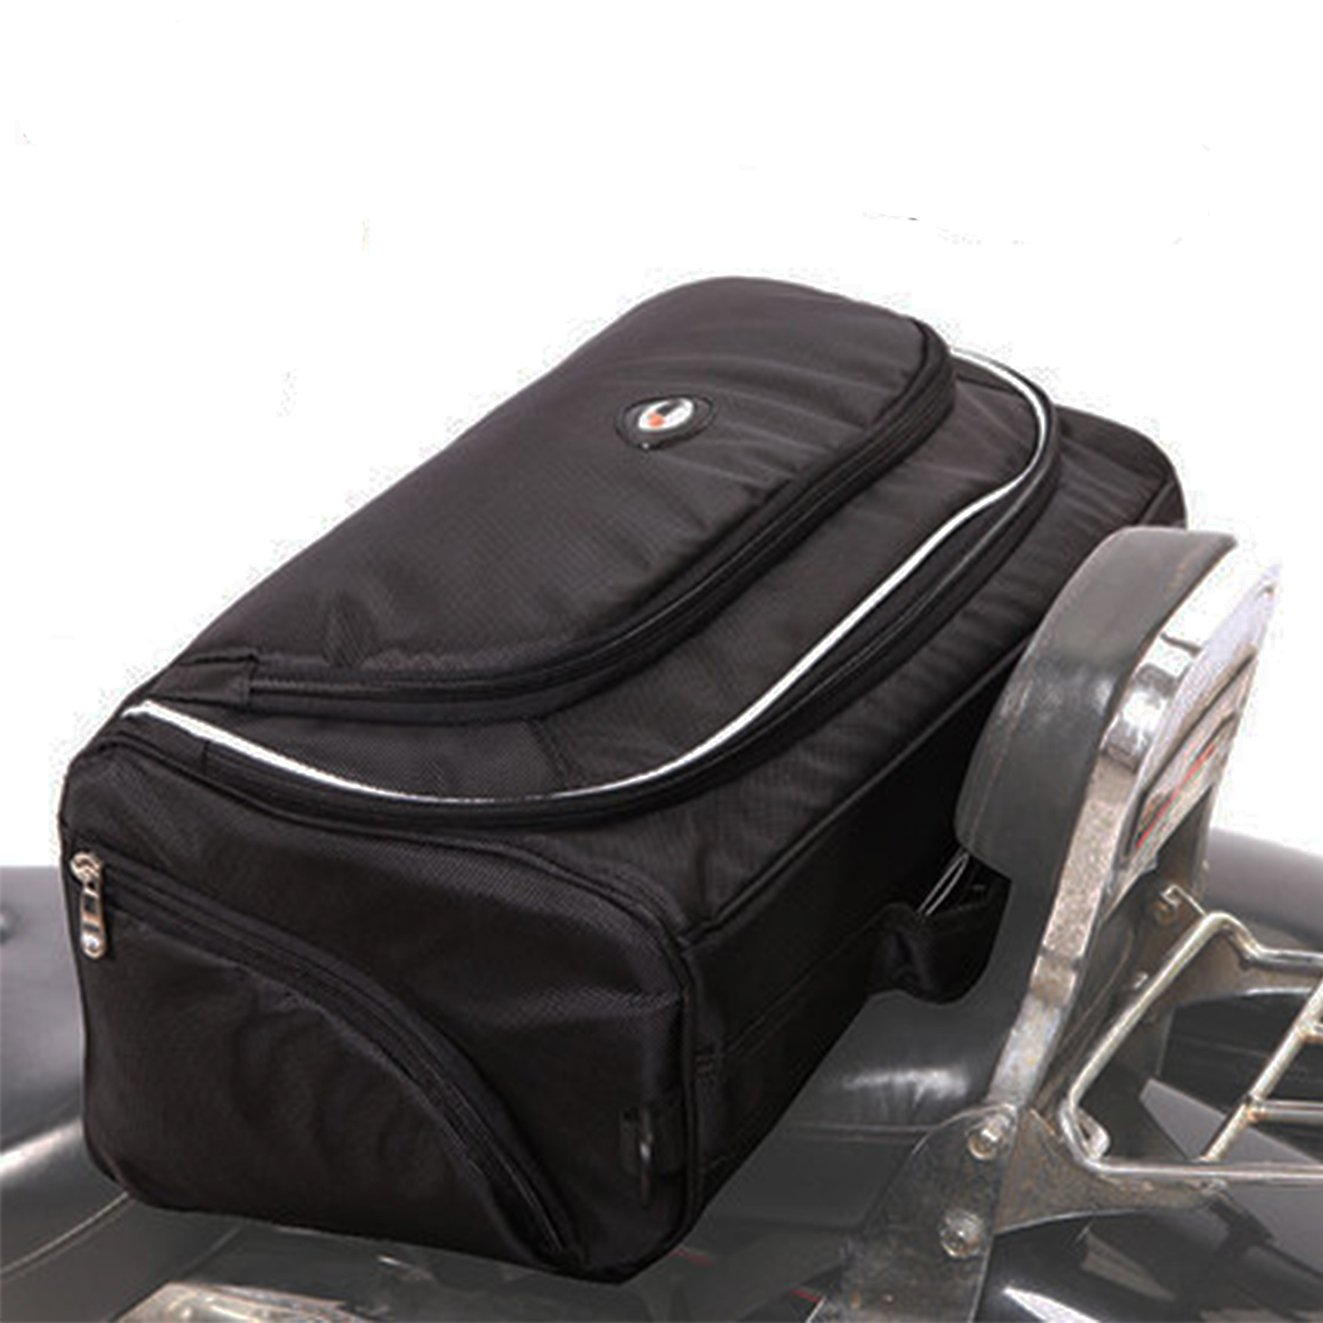 SEEU Sport Motorcycle Tail Seat Bag, Water Resistantent, 53 Liter Large Capacity